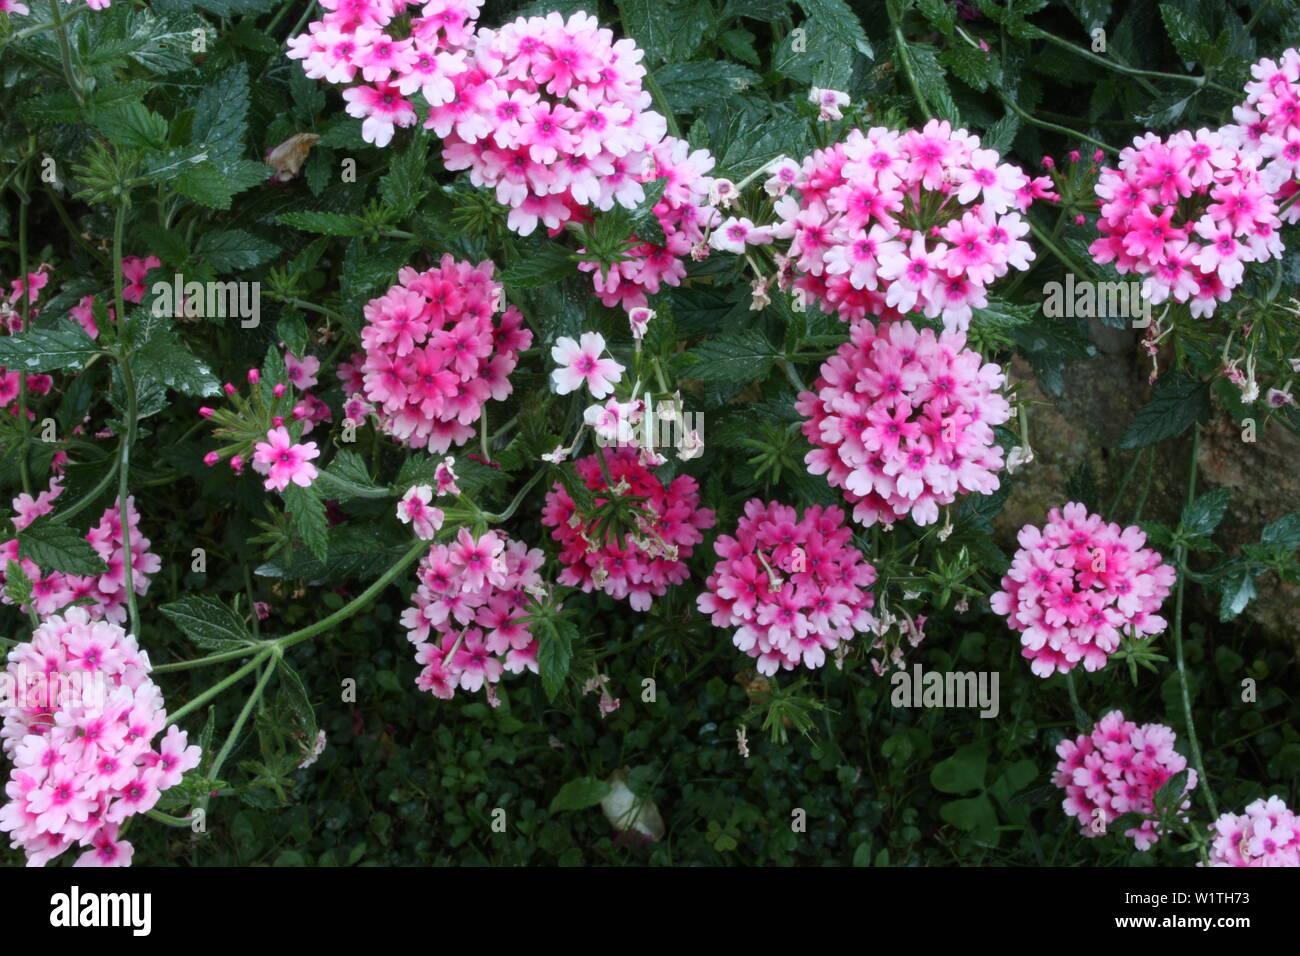 lush green bush of pink and purple verbena flower Stock Photo